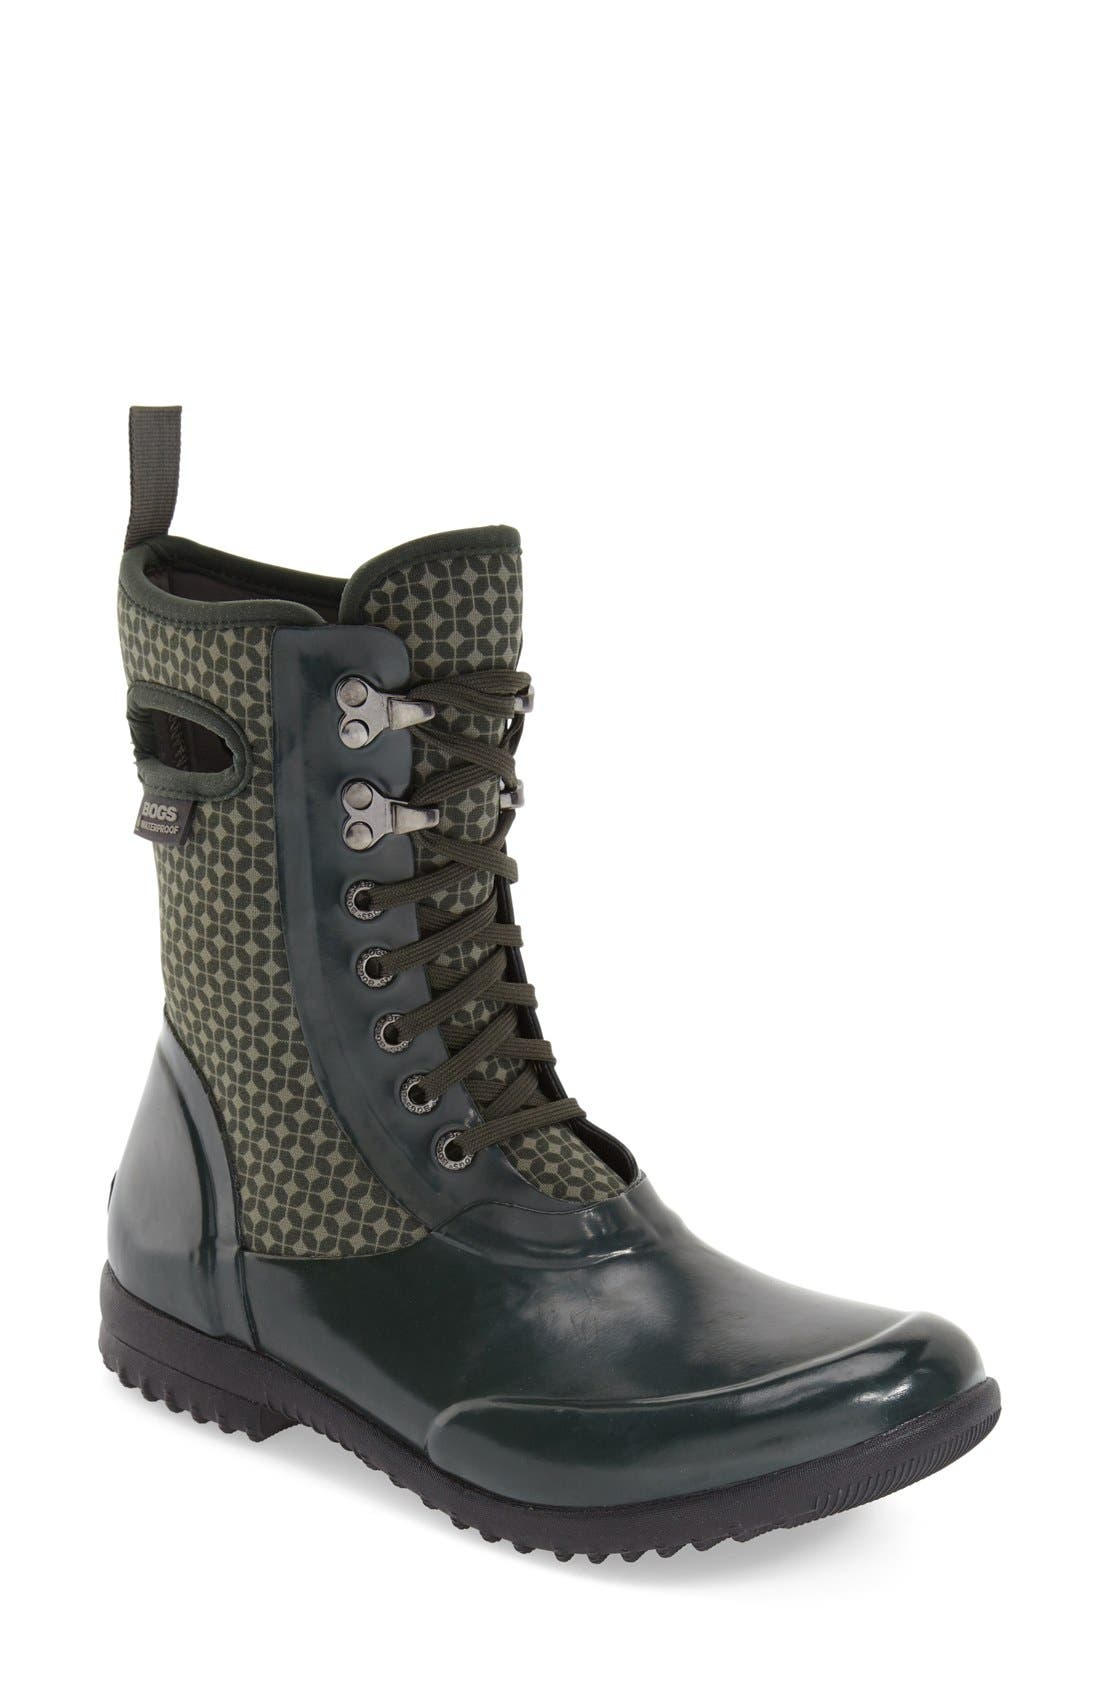 Bogs 'Sidney Cravat' Lace-Up Waterproof Boot (Women)